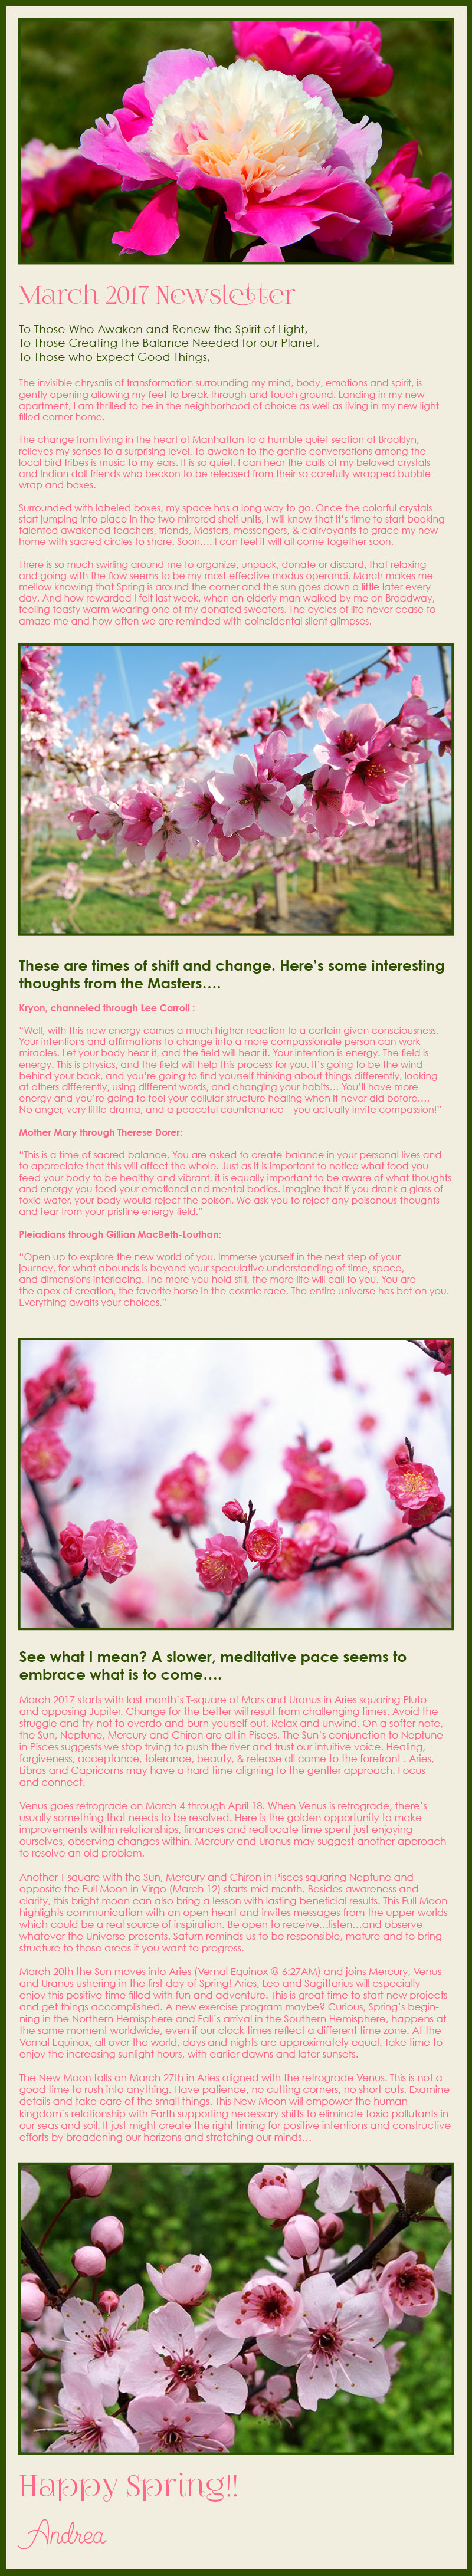 March-Newsletter-2017.jpg